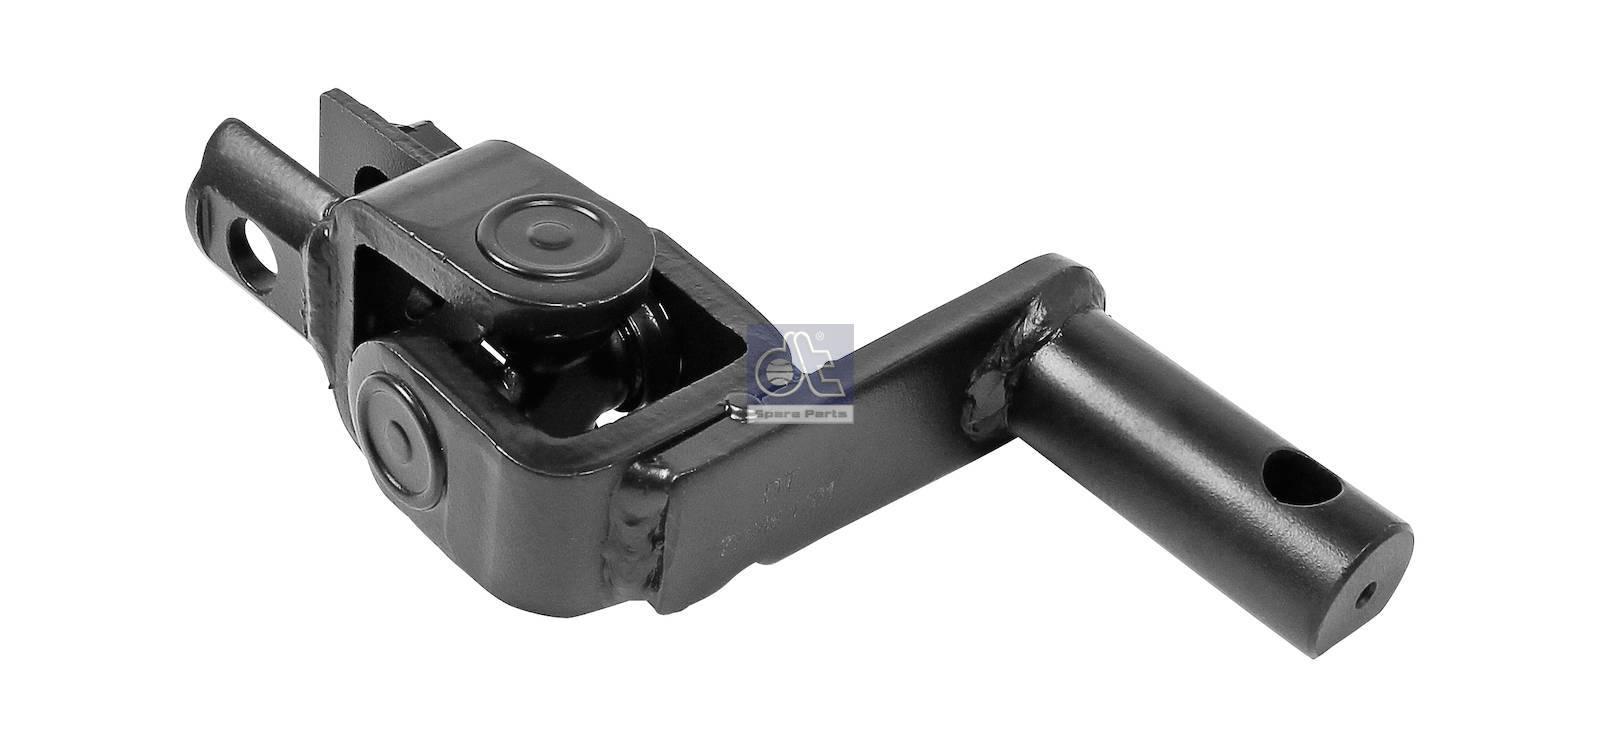 Universal joint, gear shift rod